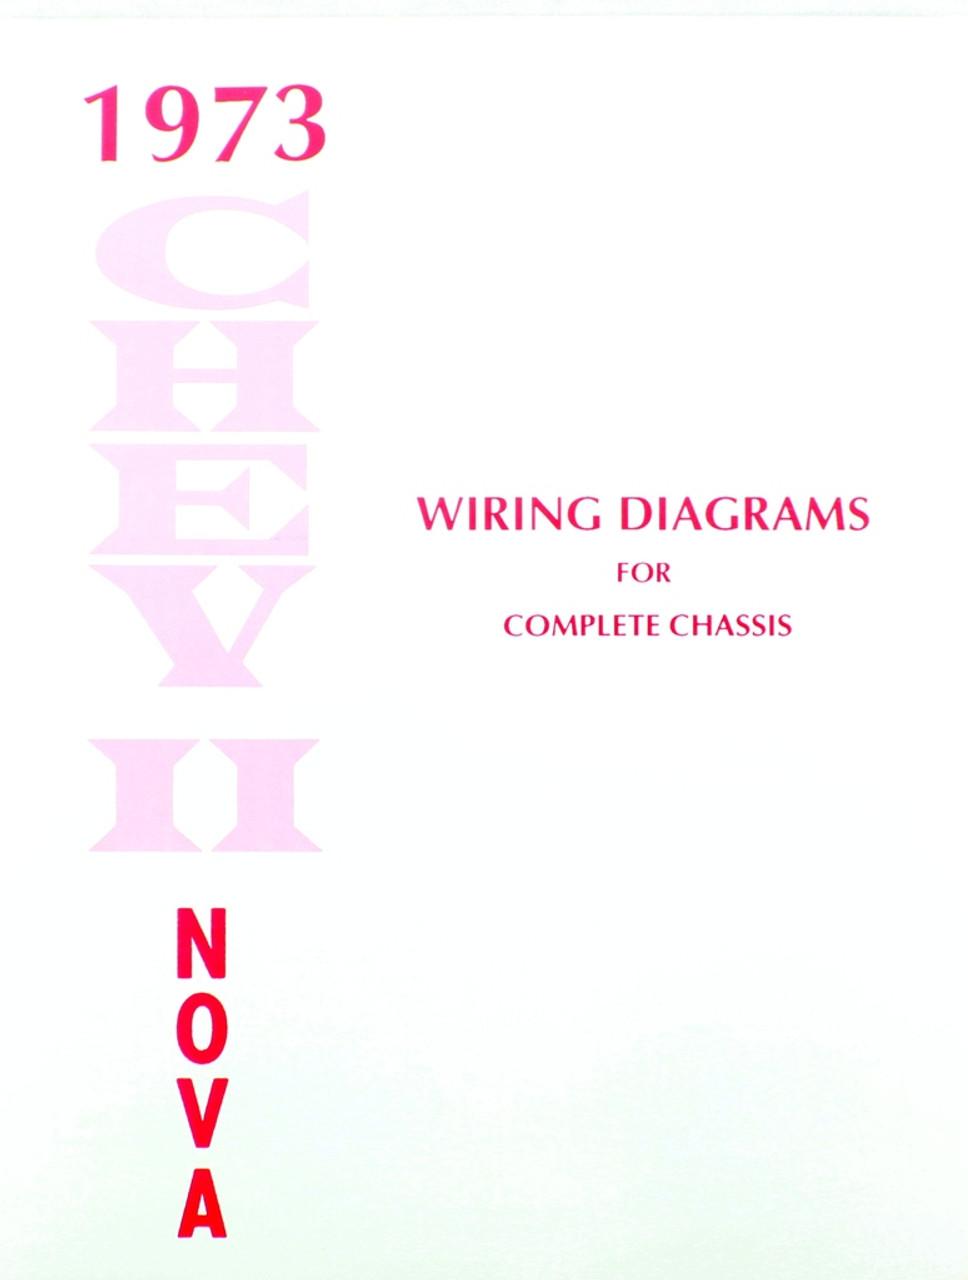 73 chevy nova electrical wiring diagram manual 1973 i 5 classic chevy rh i5chevy com 73 chevy nova wiring diagram 73 Nova Wiring Diagram V8